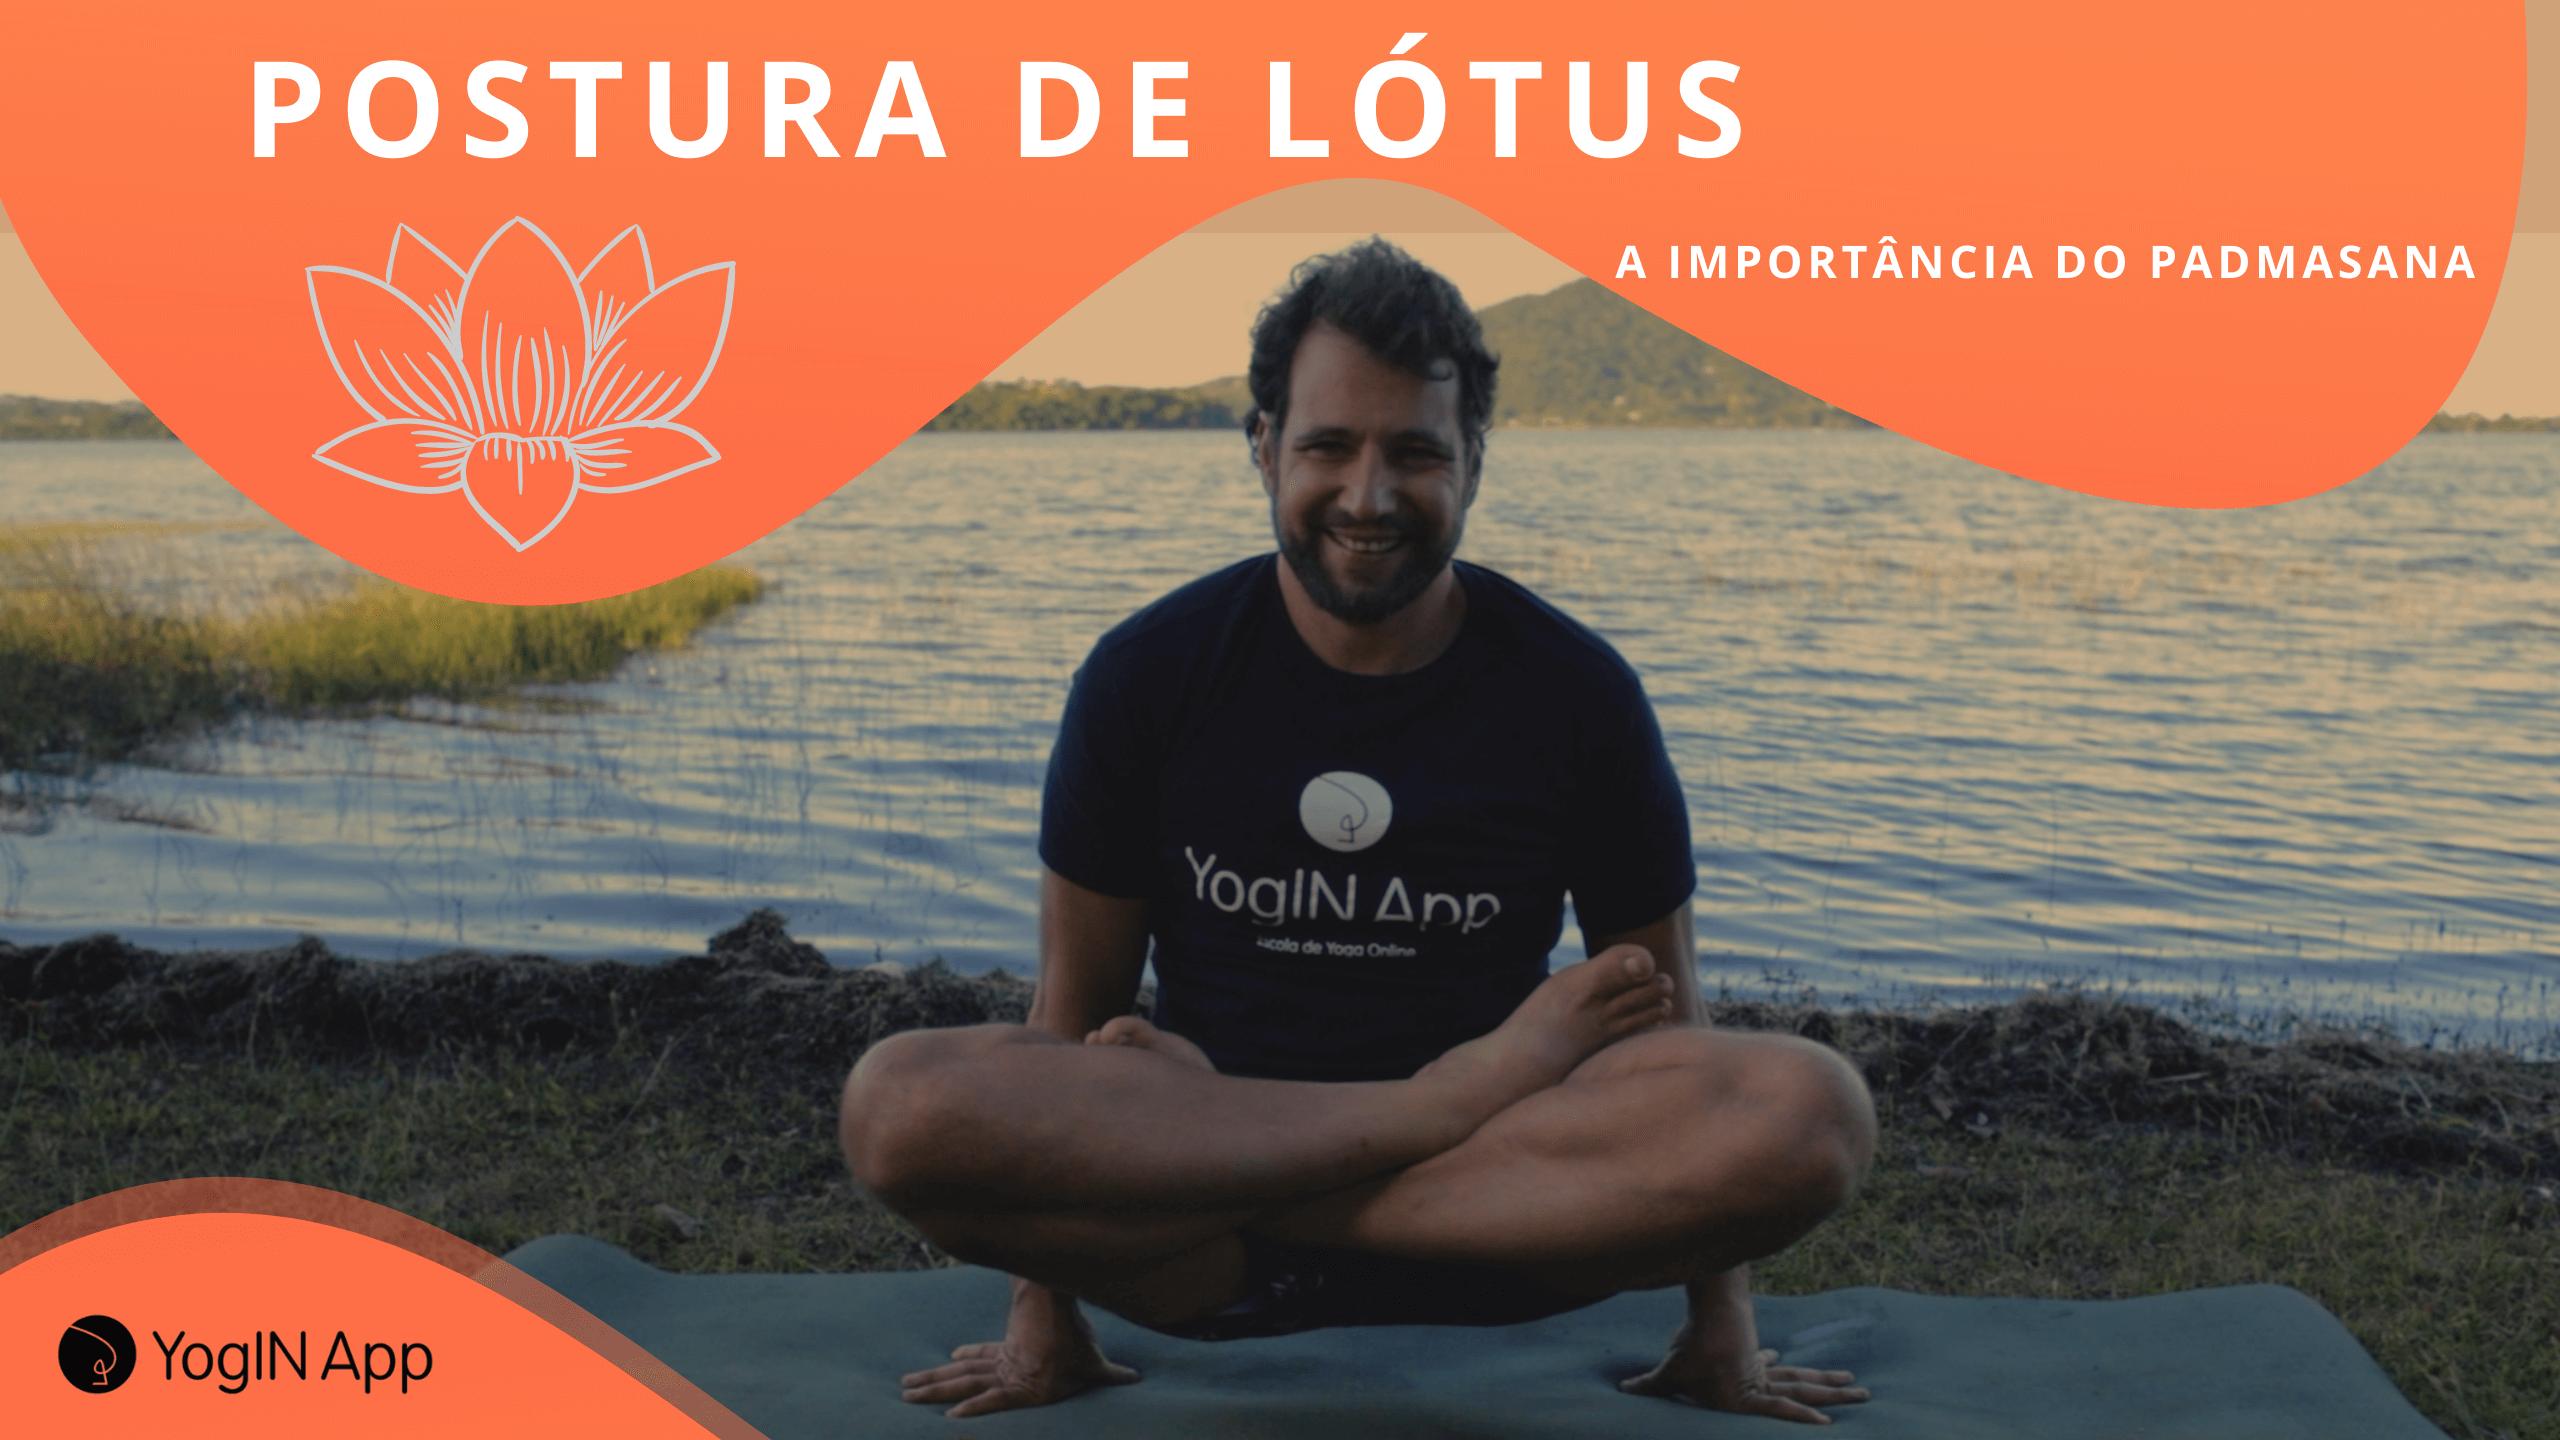 postura de lotus - importancia do padmasana